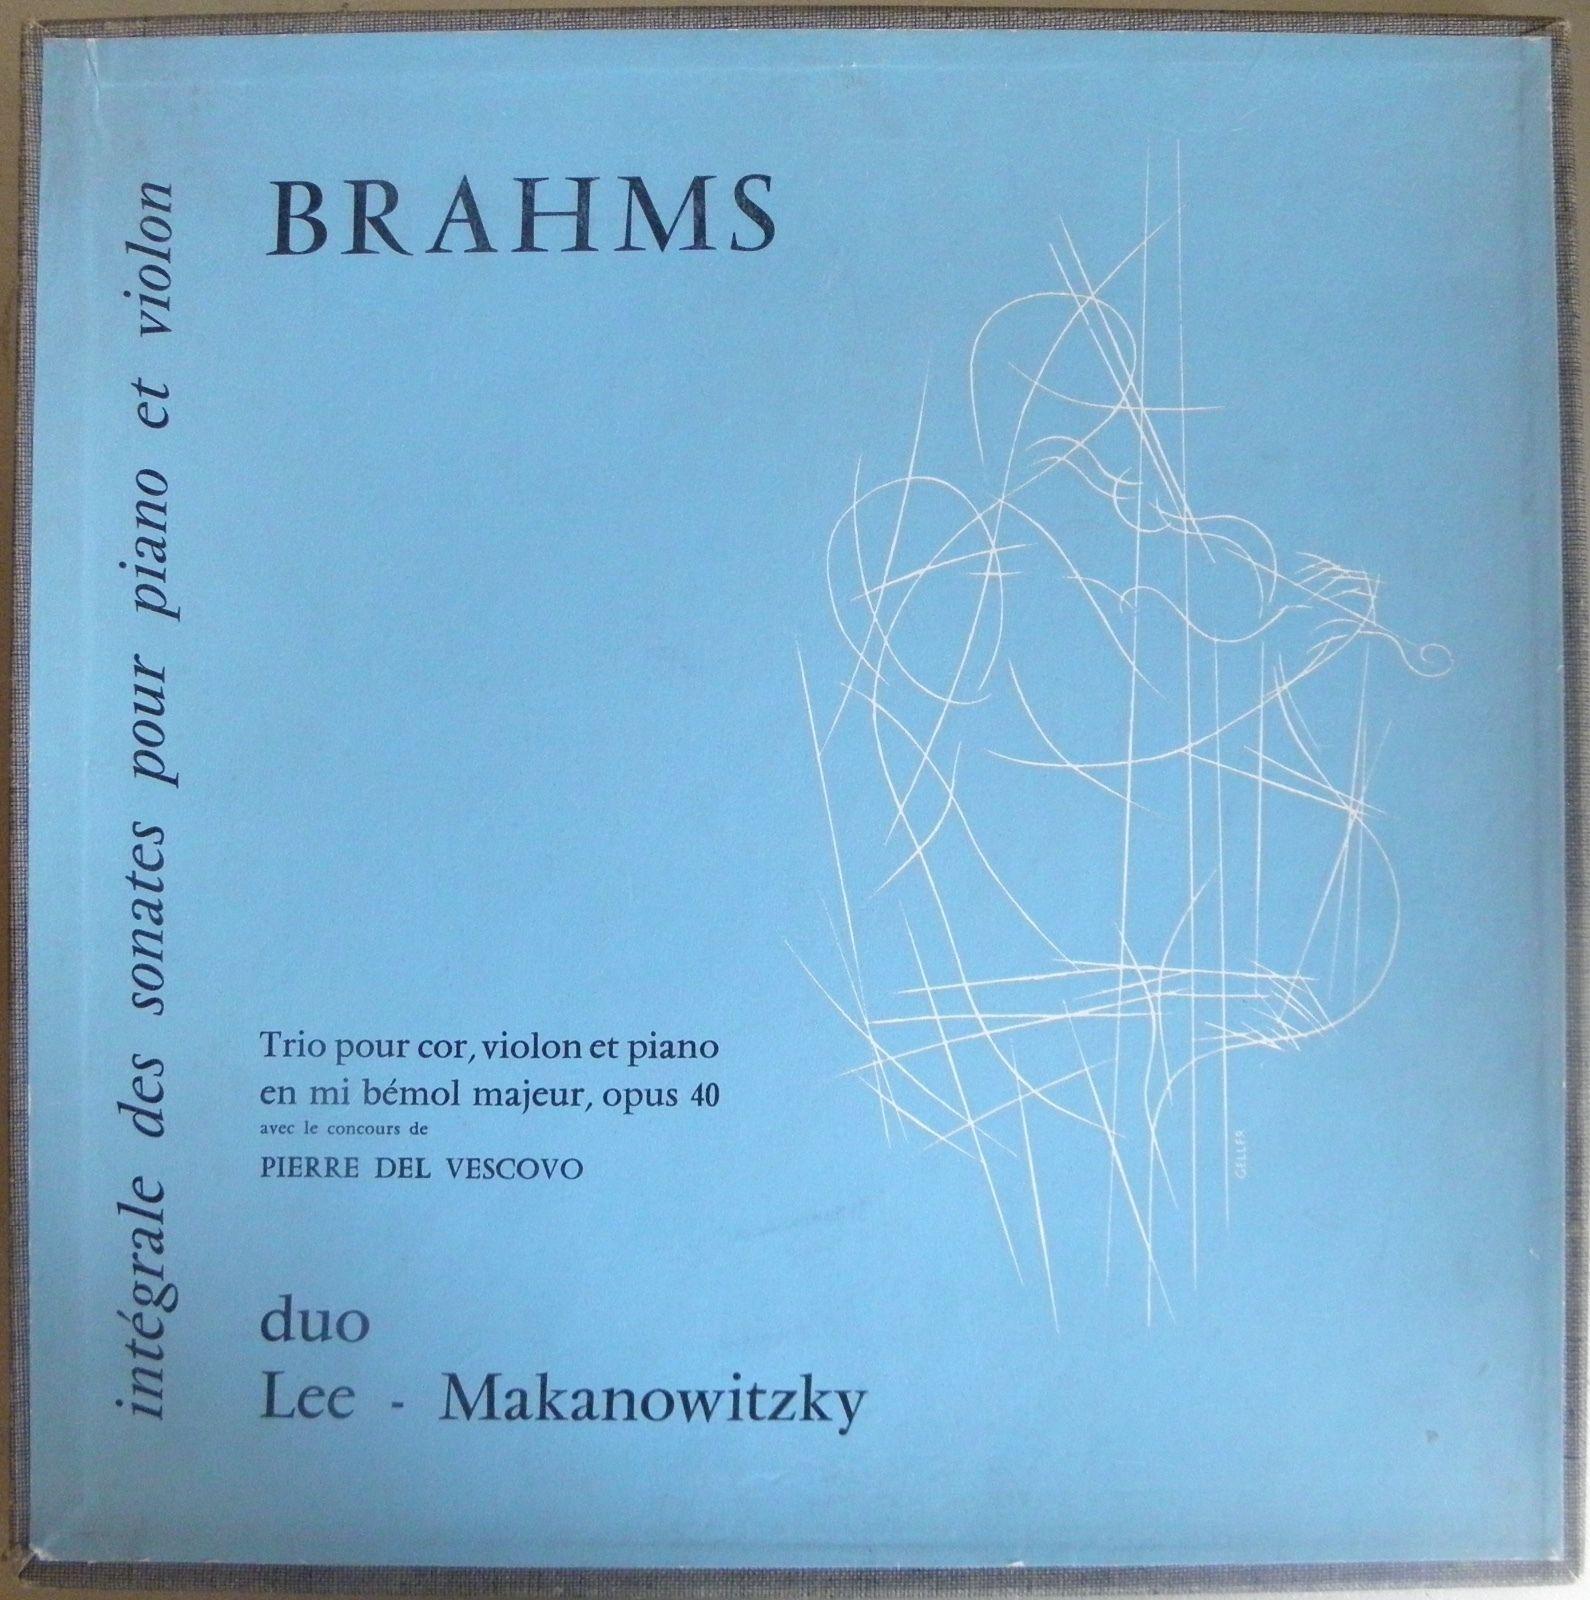 Makanowitzky / Lee / Brahms sonatas - Lumen -  LAST AUCTION